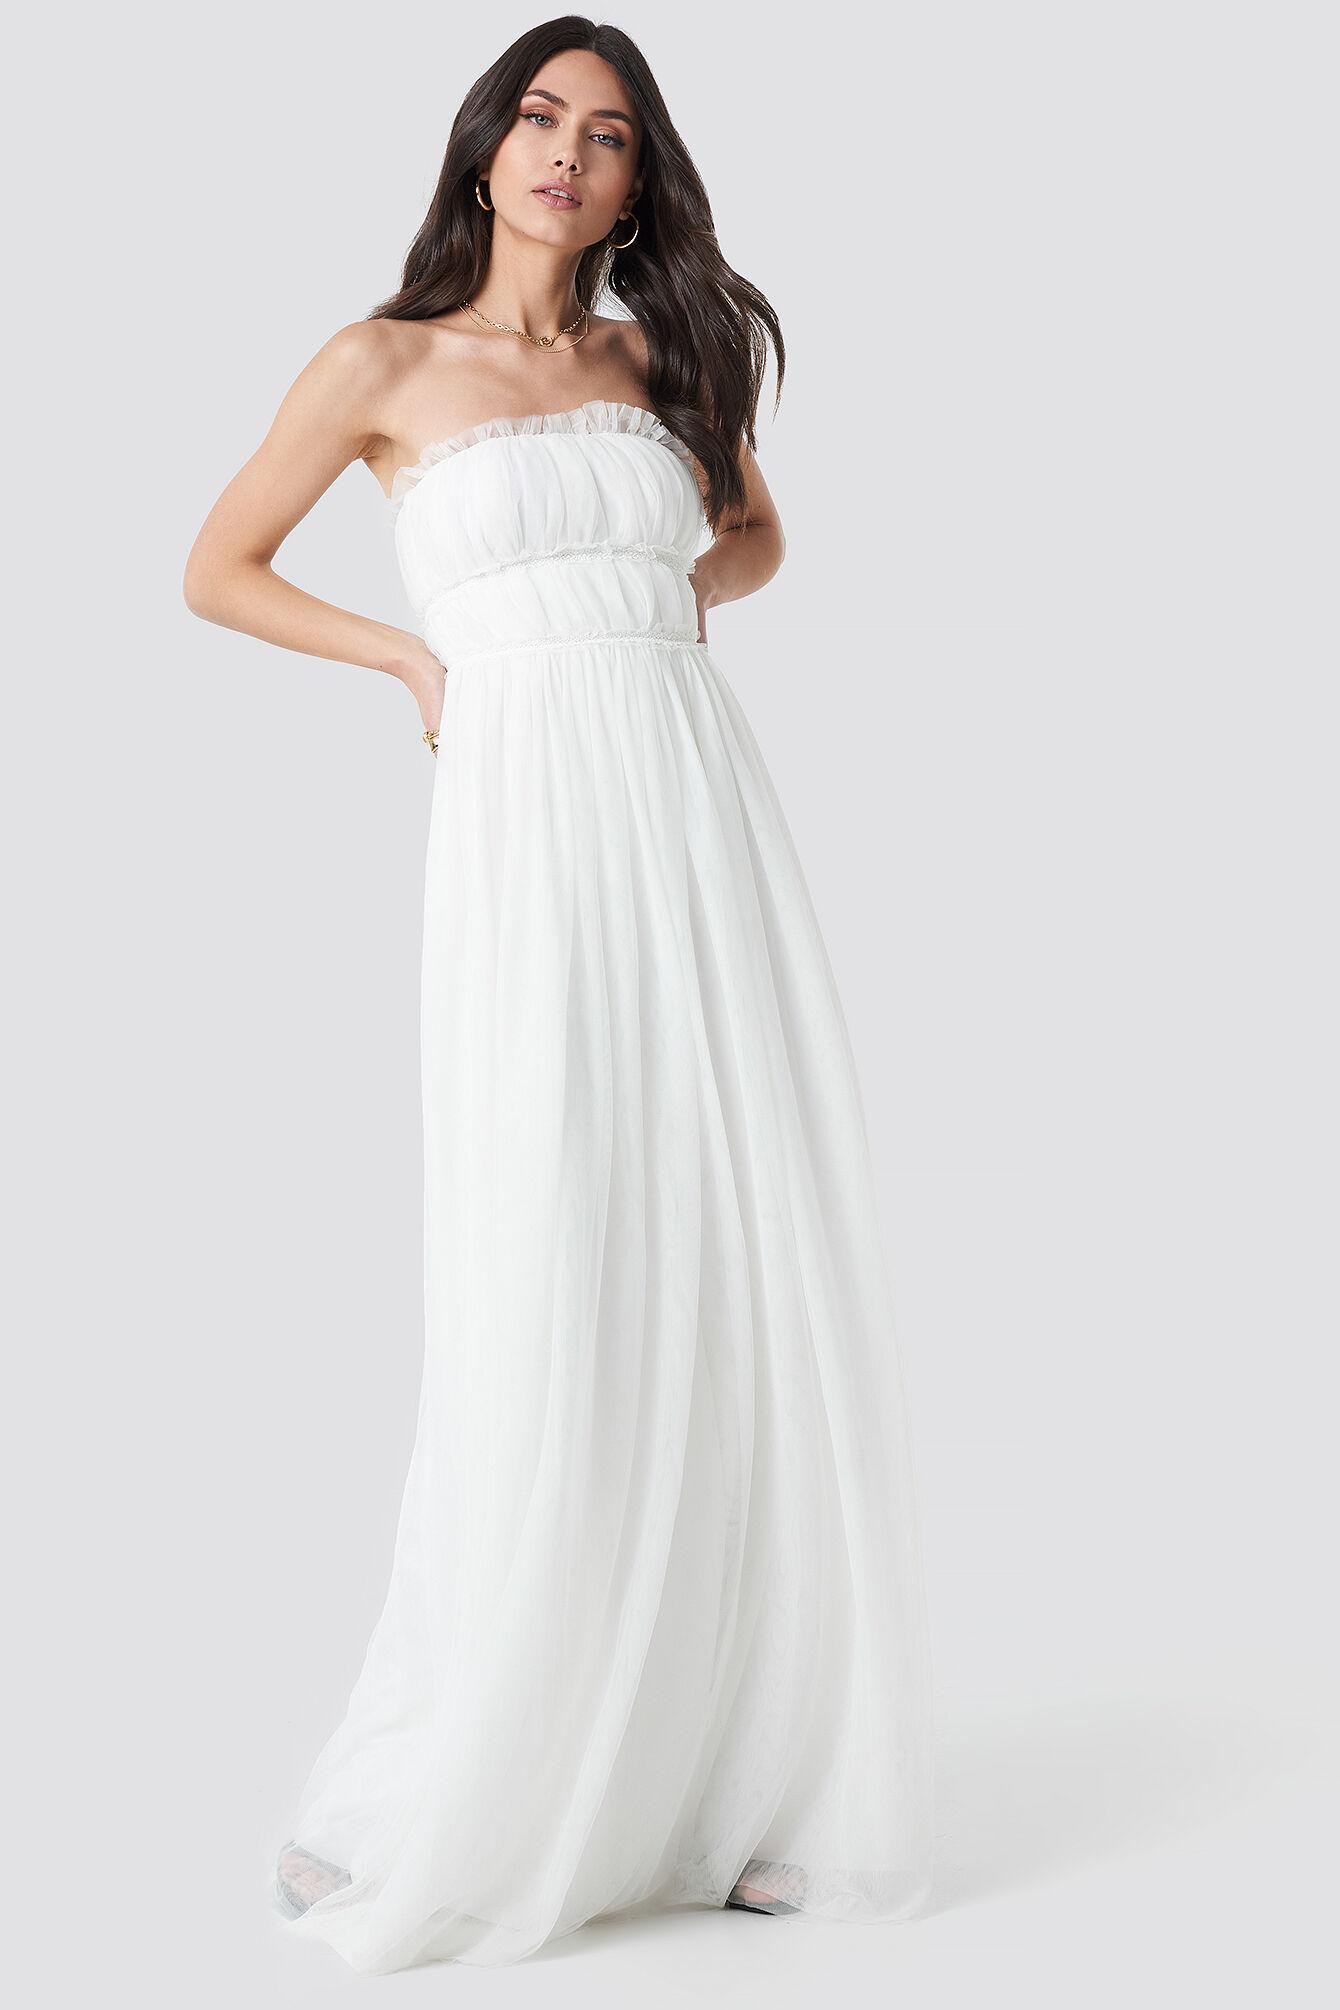 Image of Trendyol Detailed Evening Dress - White